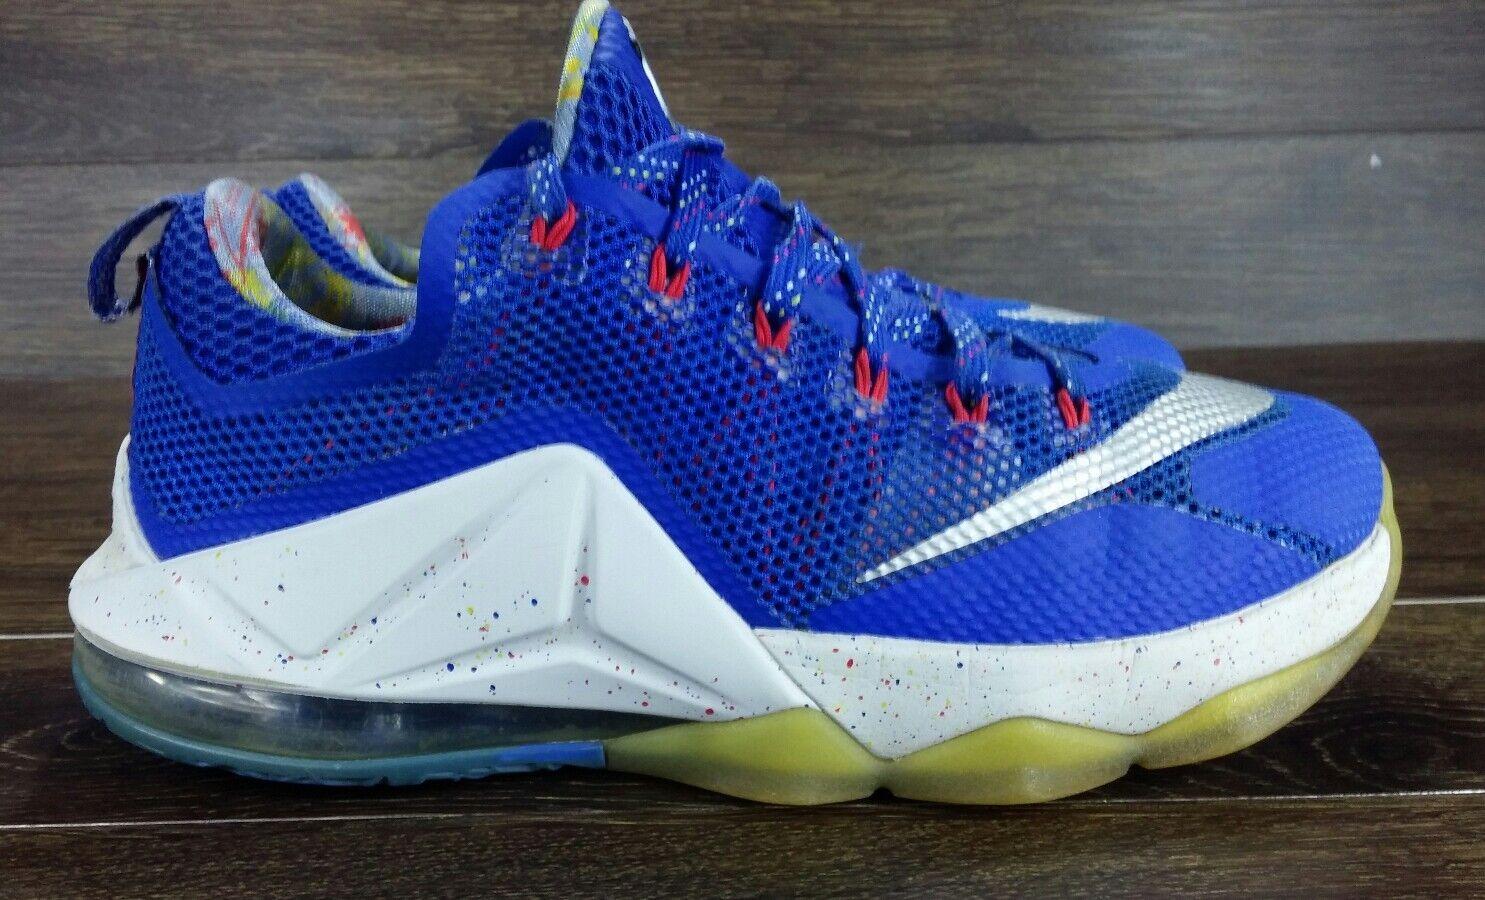 200 Nike Lebron XII 12 Low Hyper Cobalt 812560-406 Men's Size US 11 Eu 45 bluee